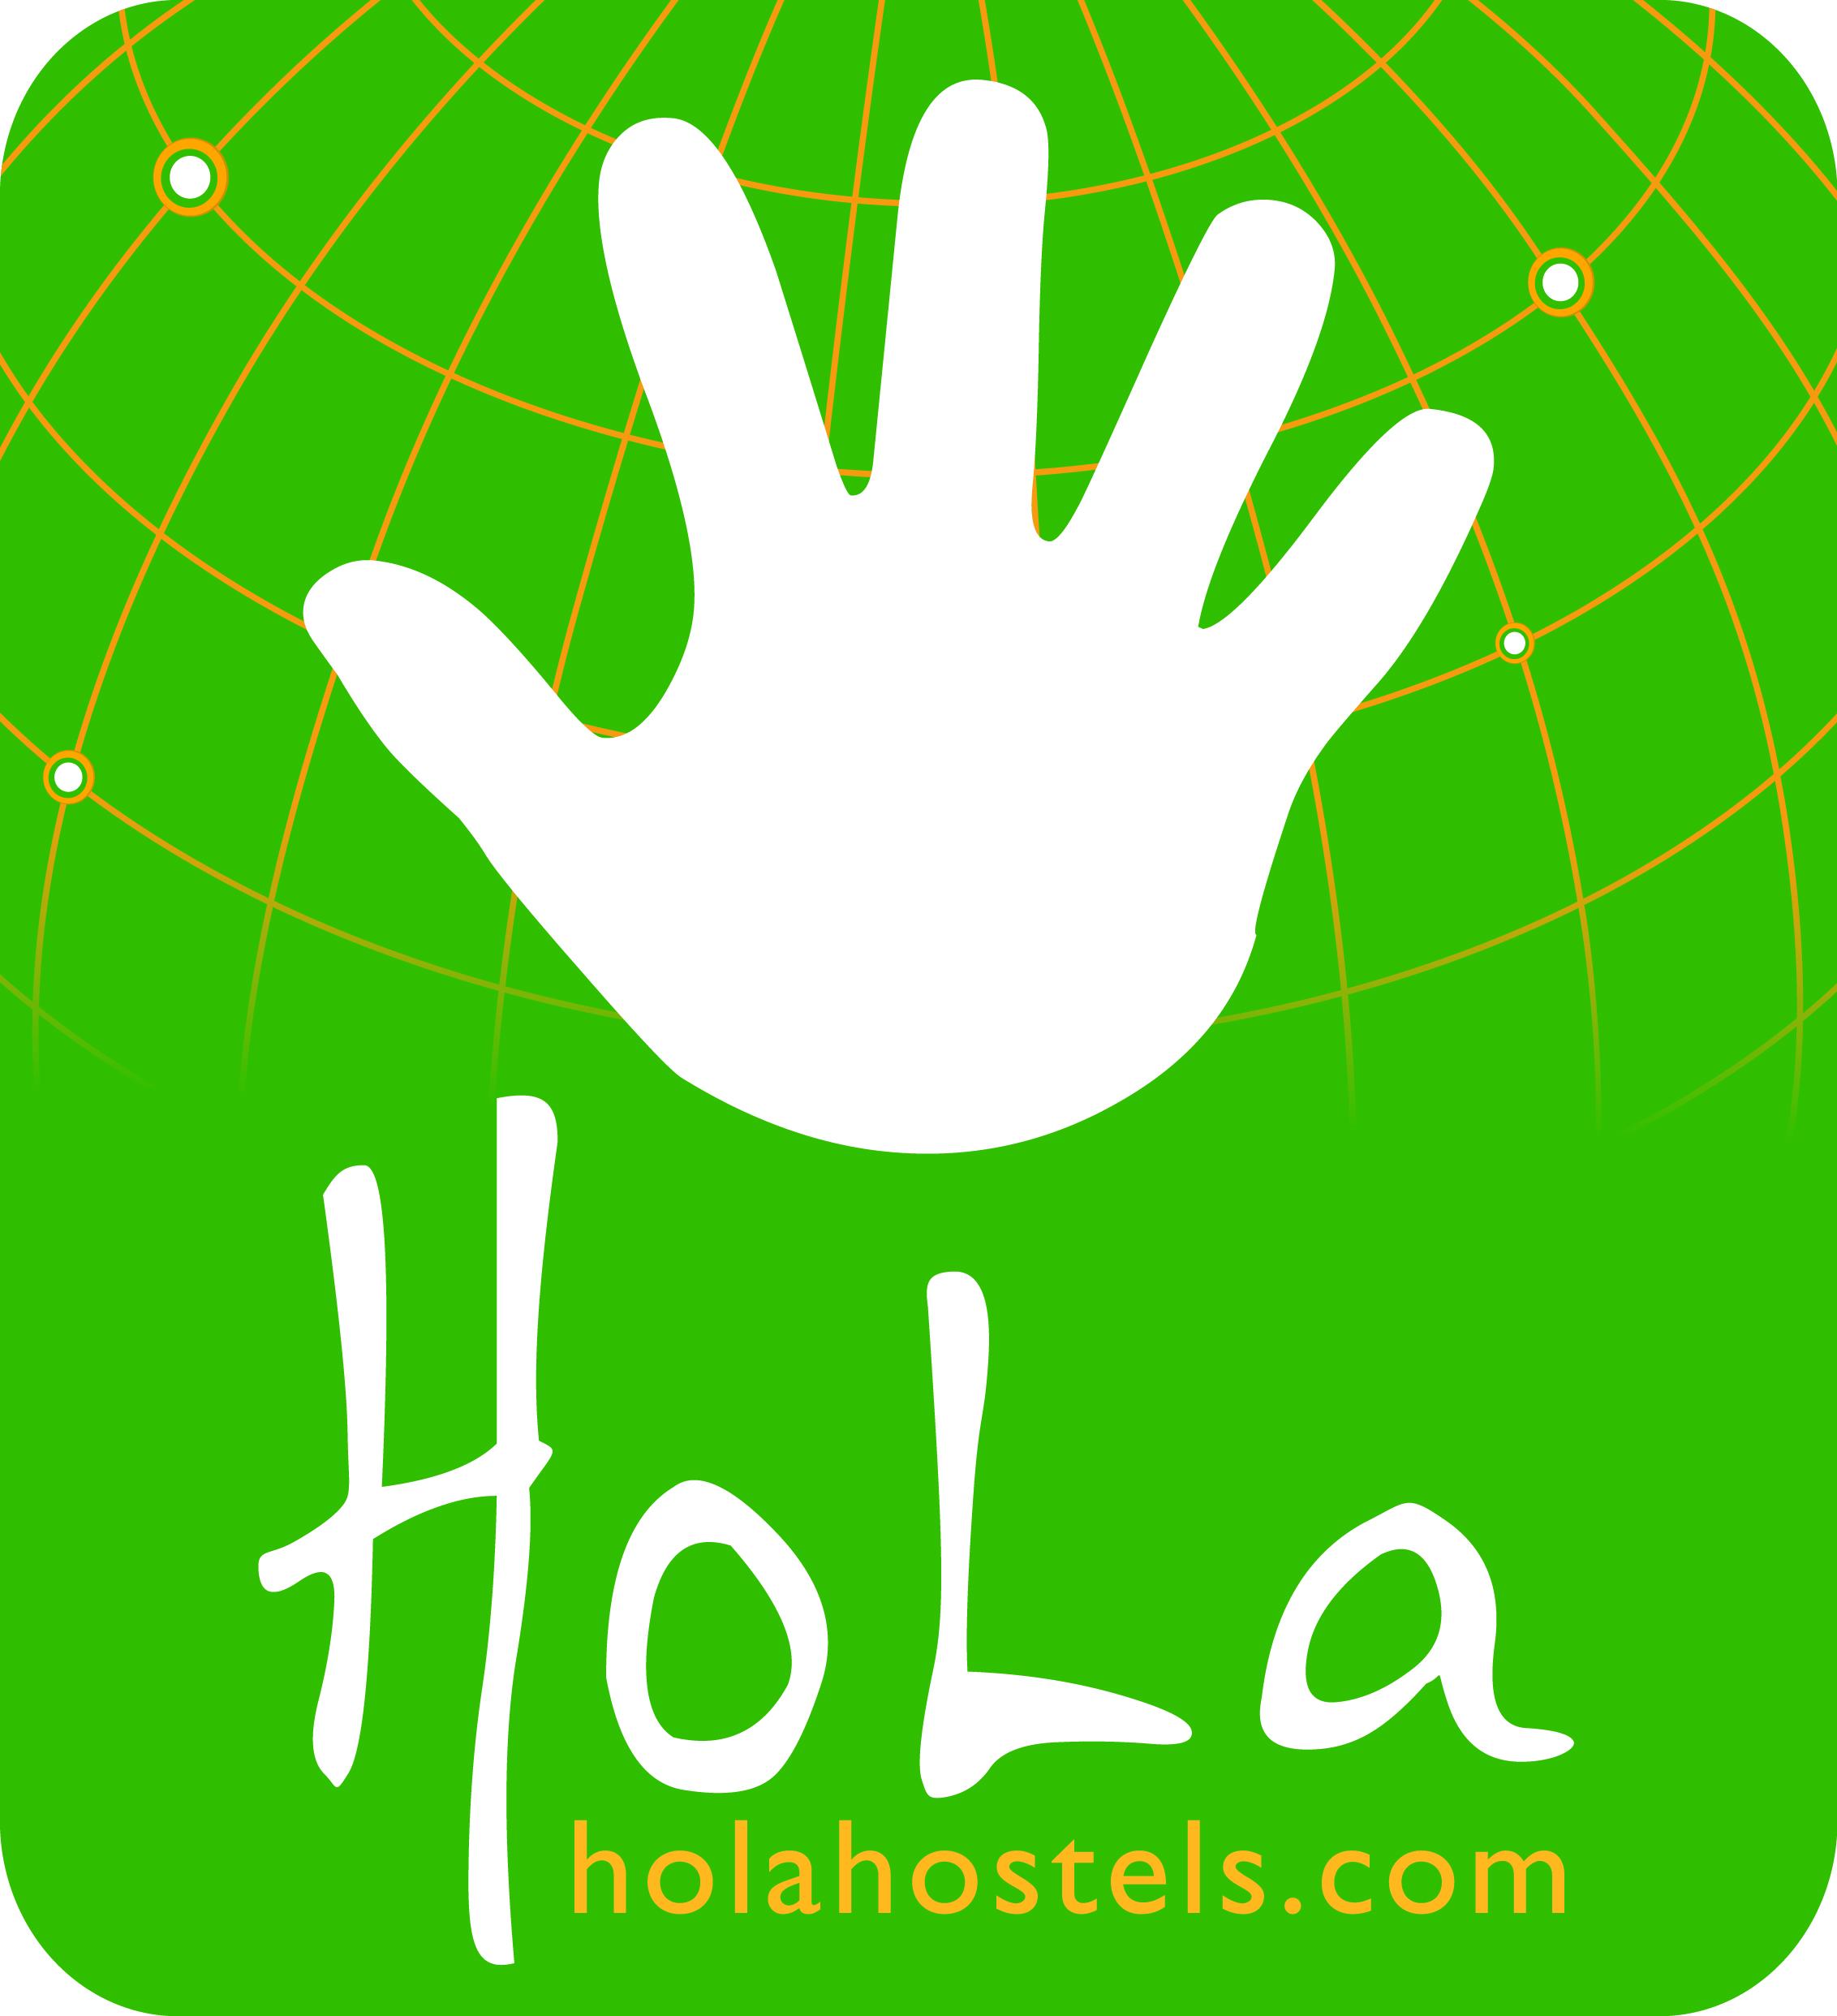 SOUTH AMERICA_ www.holahostels.com